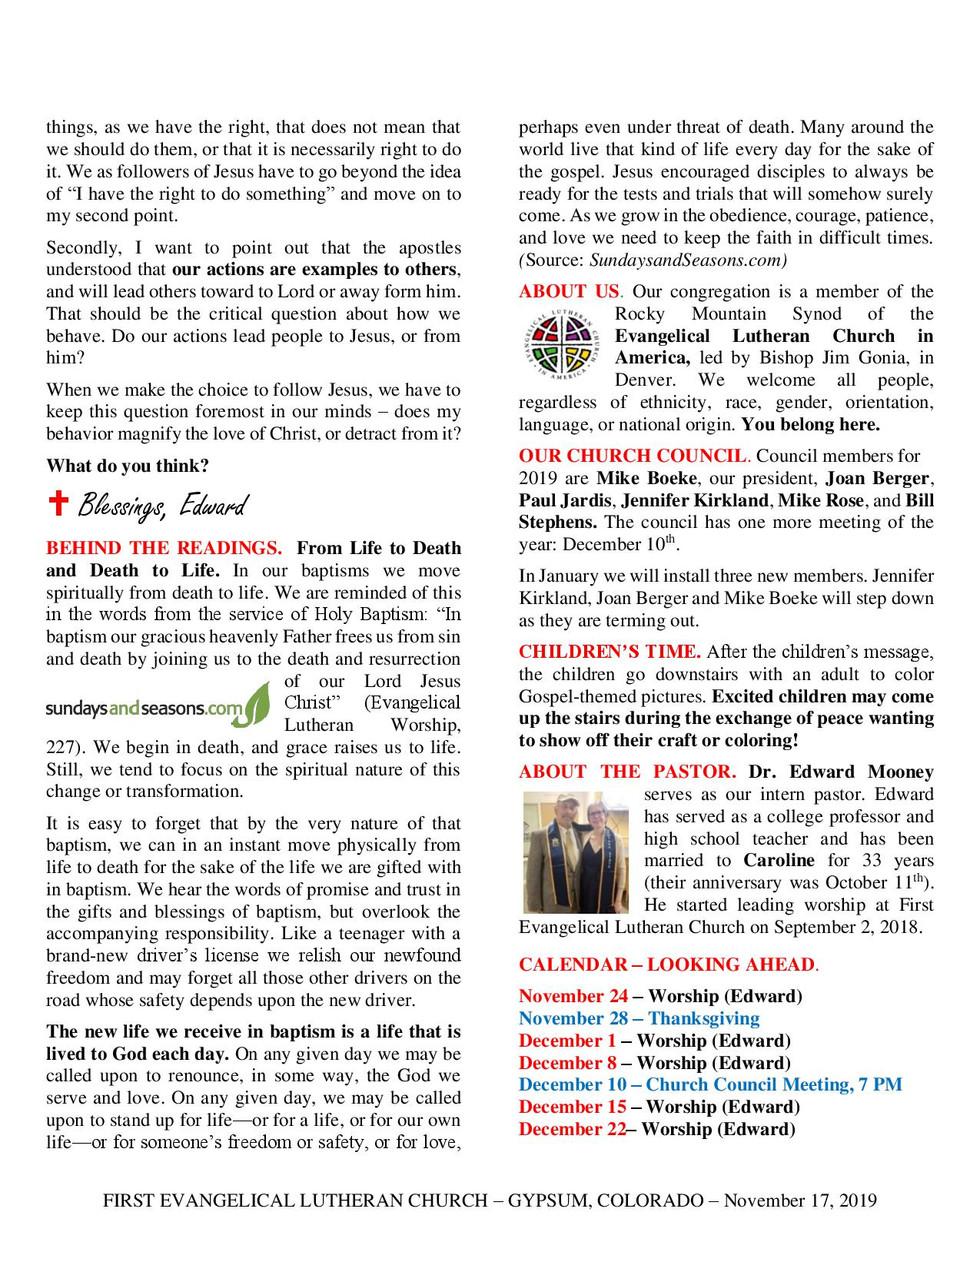 Newsletter - November 17, 2019, page 2